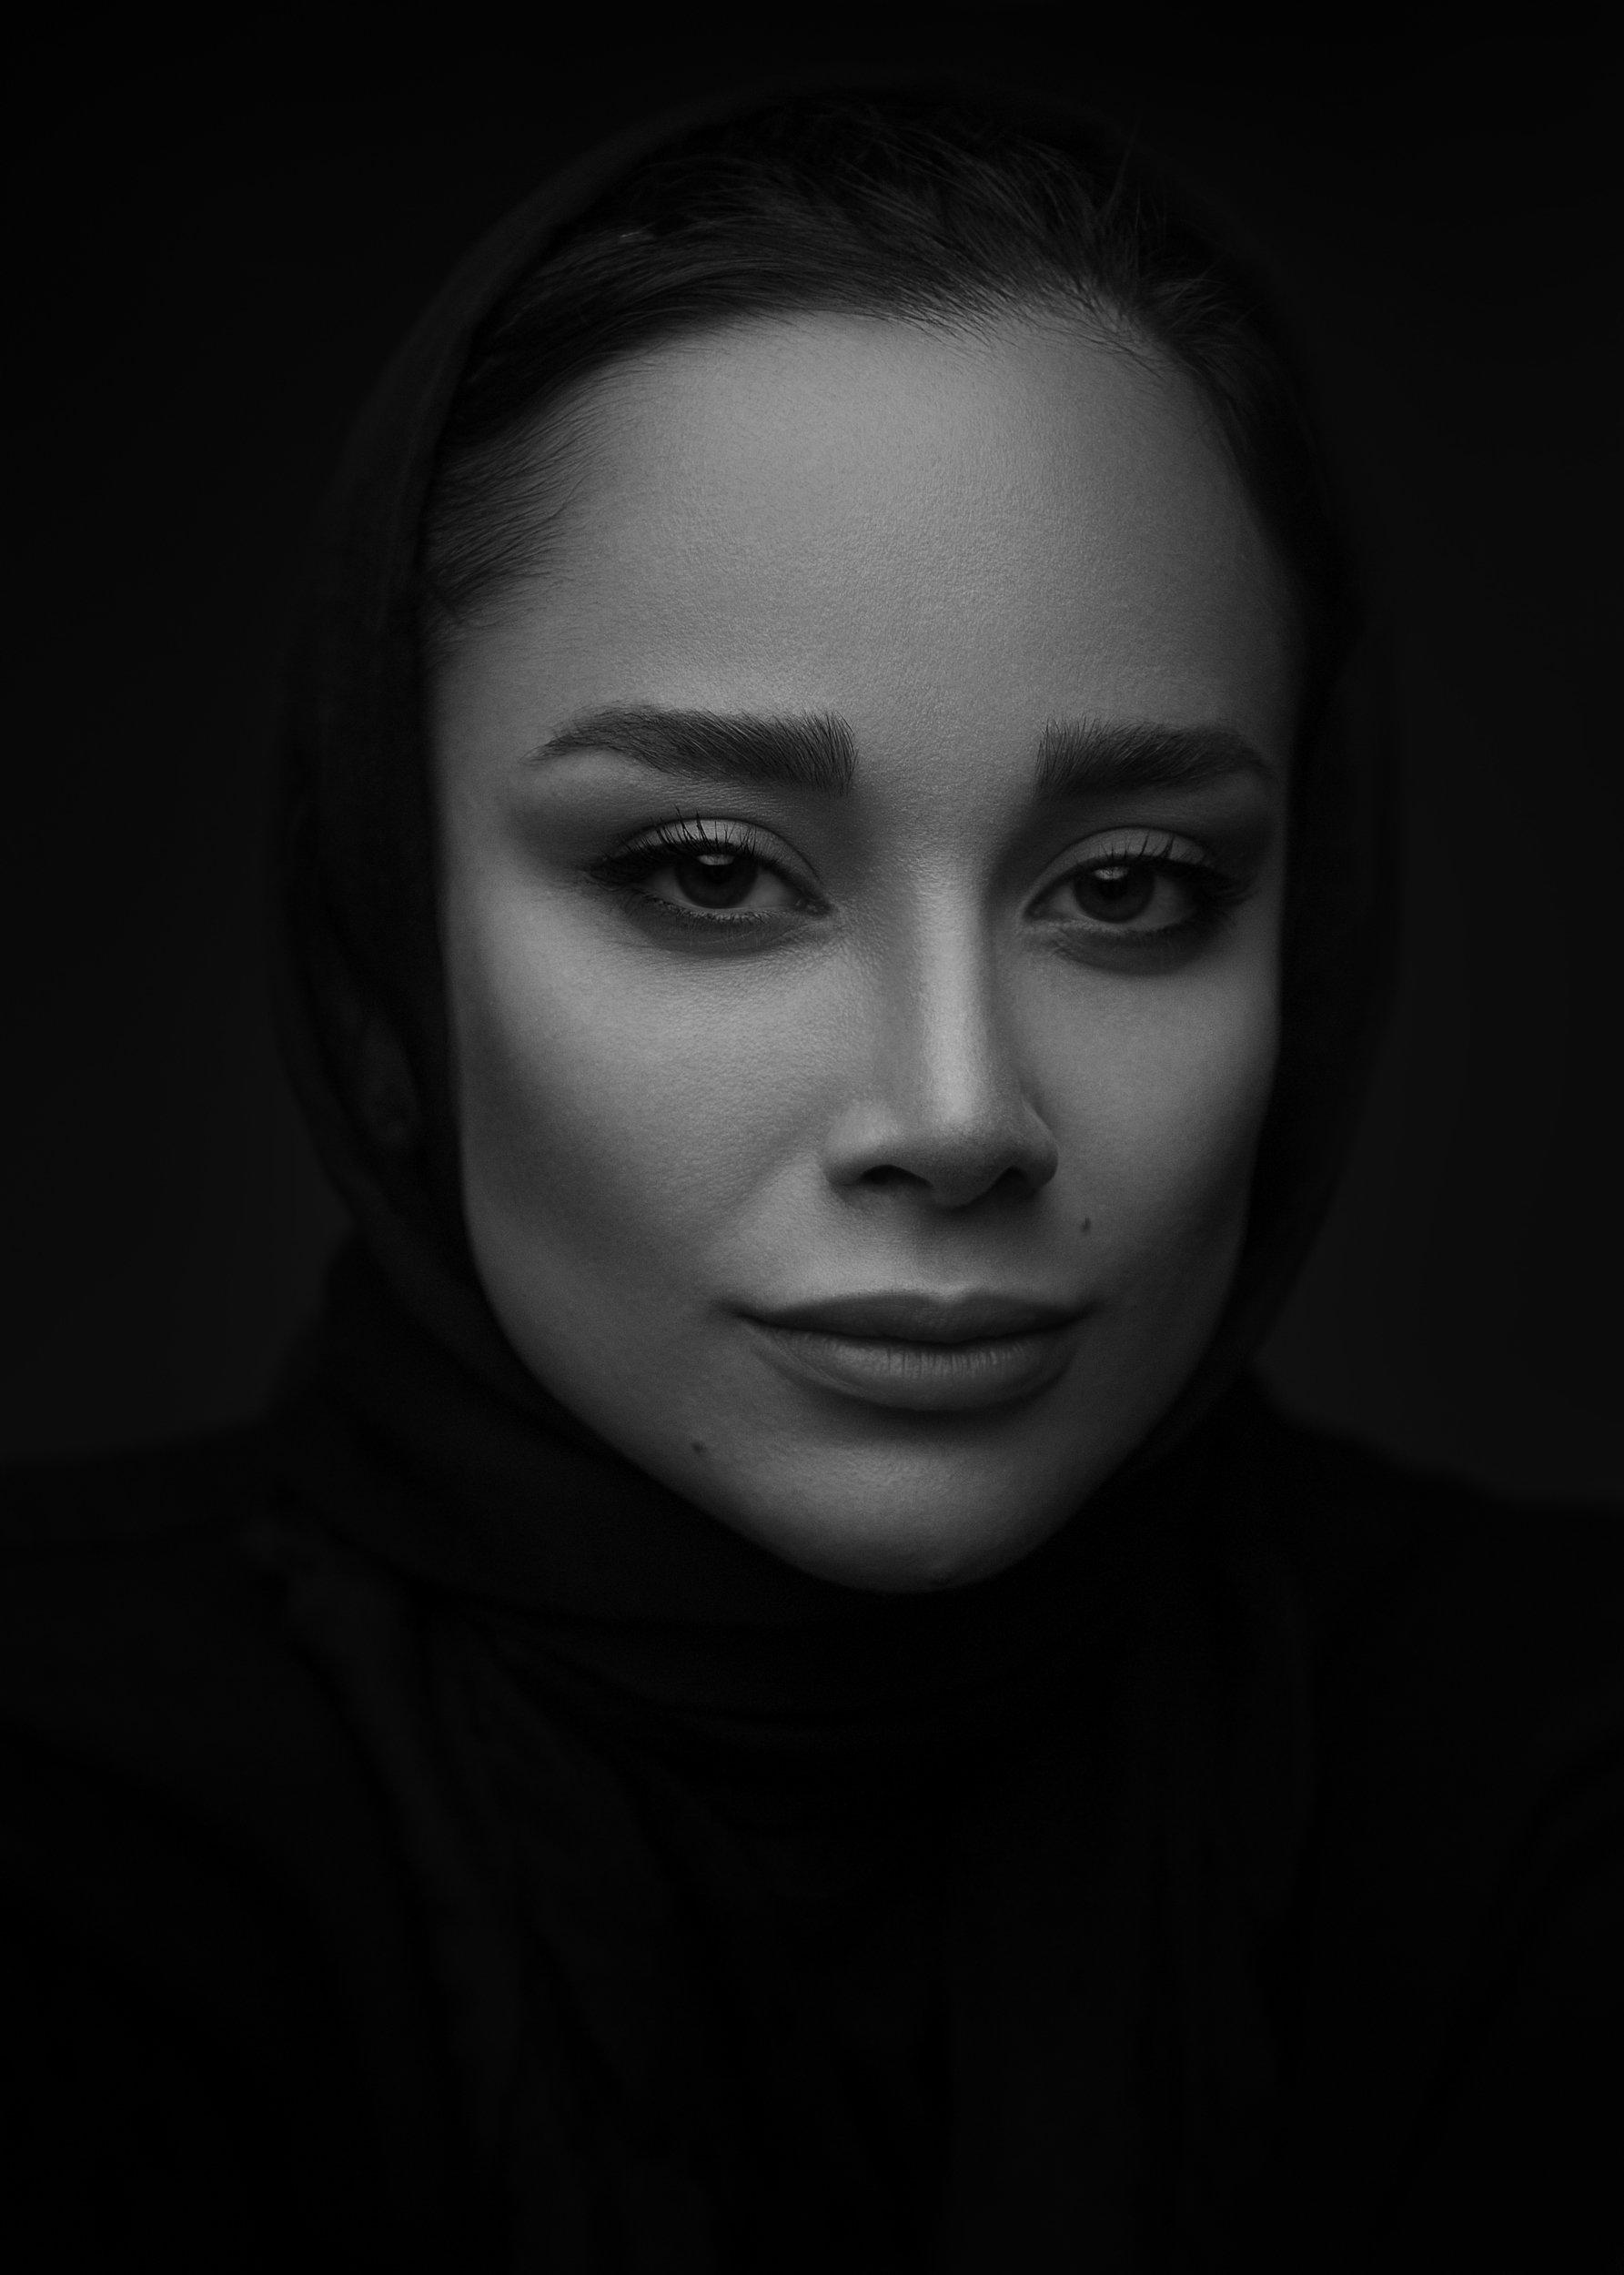 Portrait,art,artist,black&white, Amirhossein kazemi